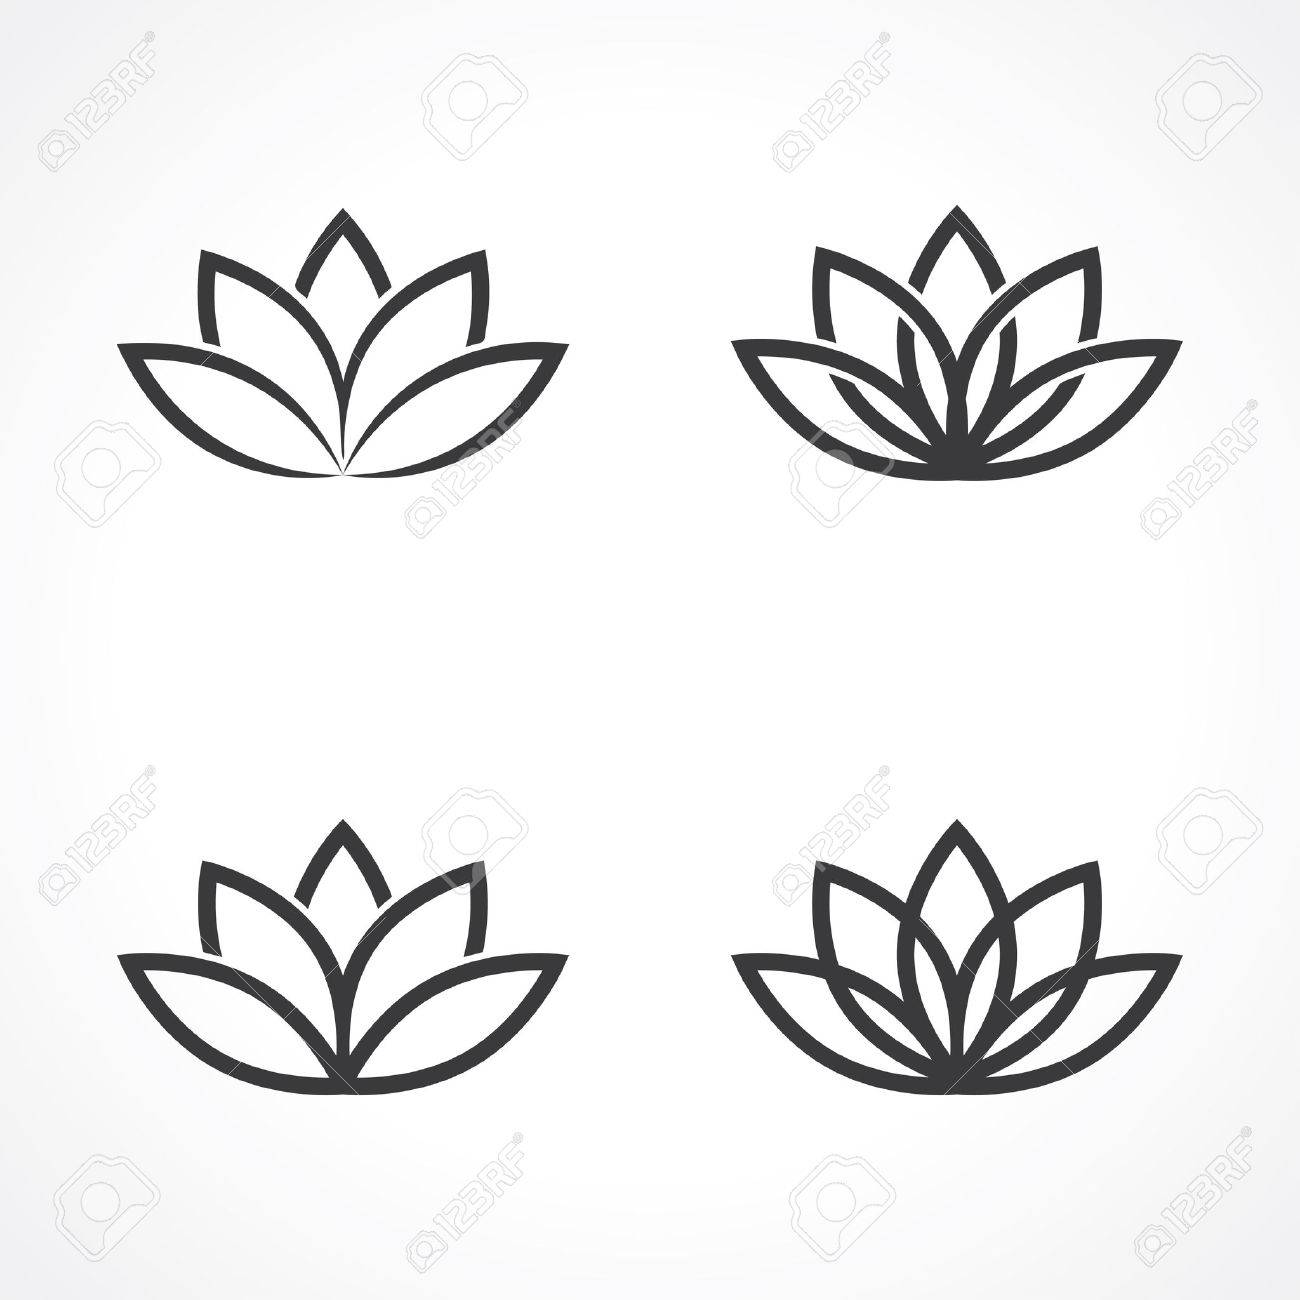 Abstract lotus symbols royalty free cliparts vectors and stock abstract lotus symbols stock vector 31401100 mightylinksfo